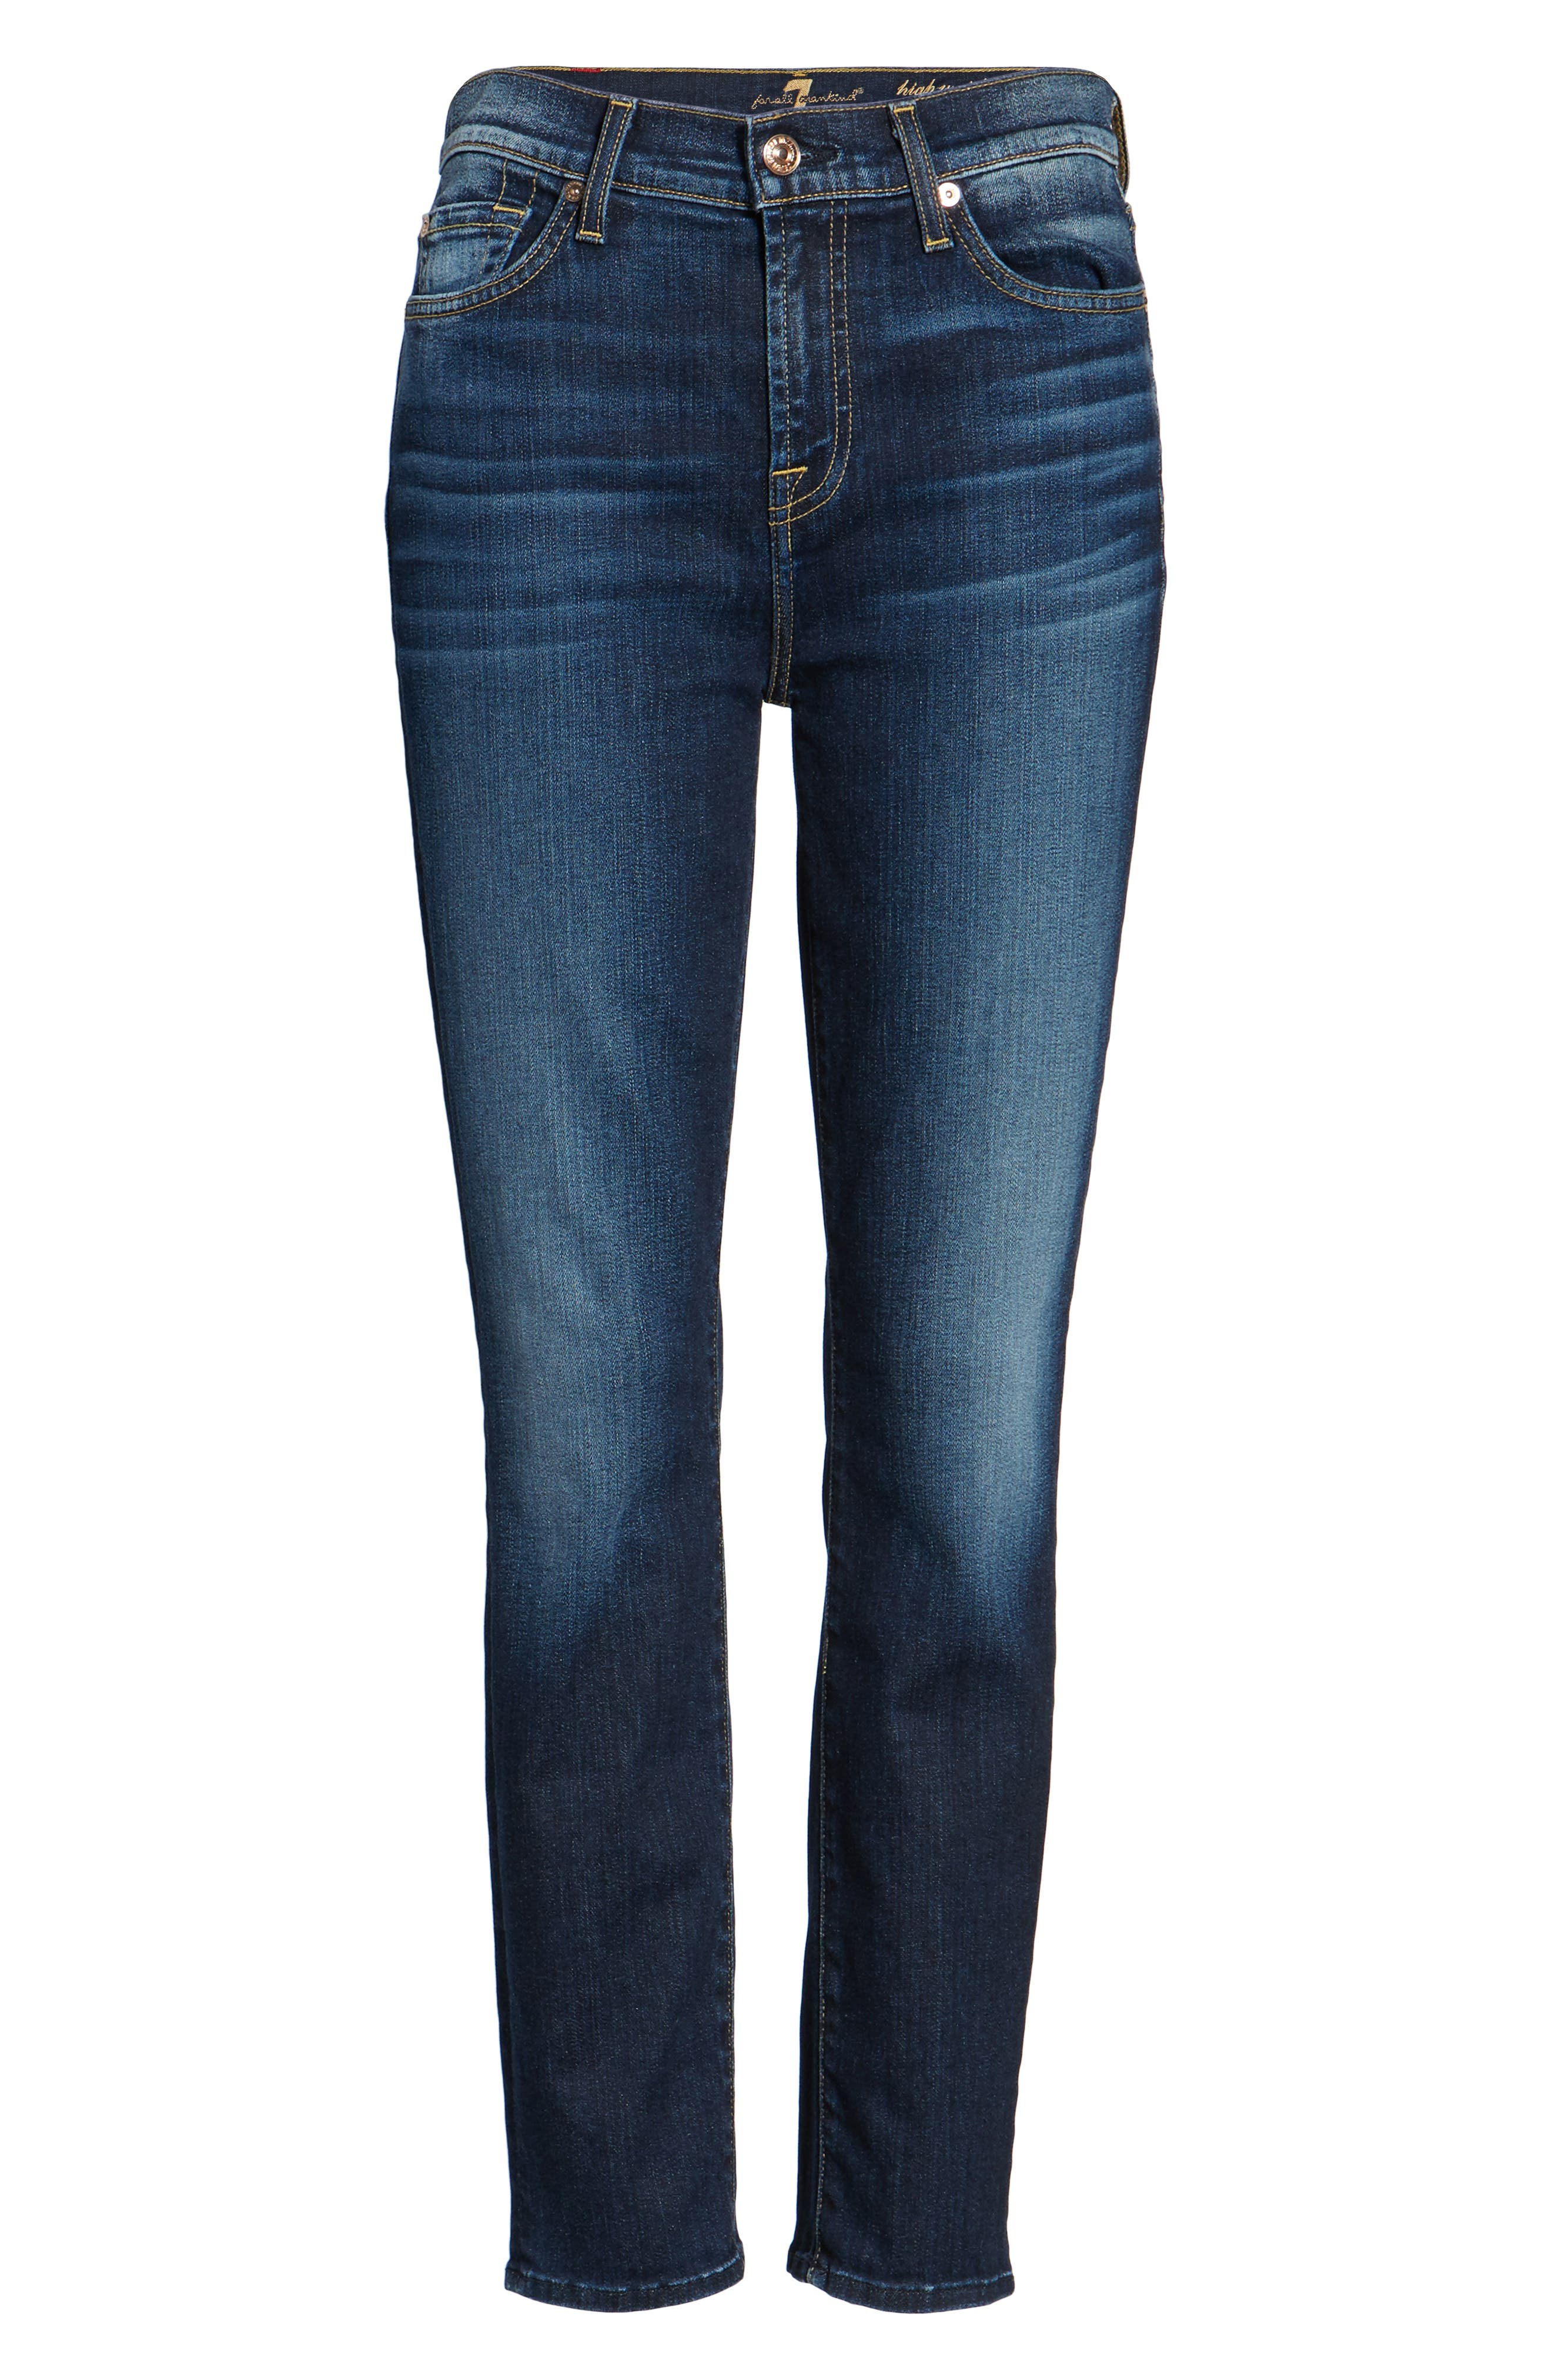 Seven7 Roxanne High Waist Ankle Jeans,                             Alternate thumbnail 6, color,                             401